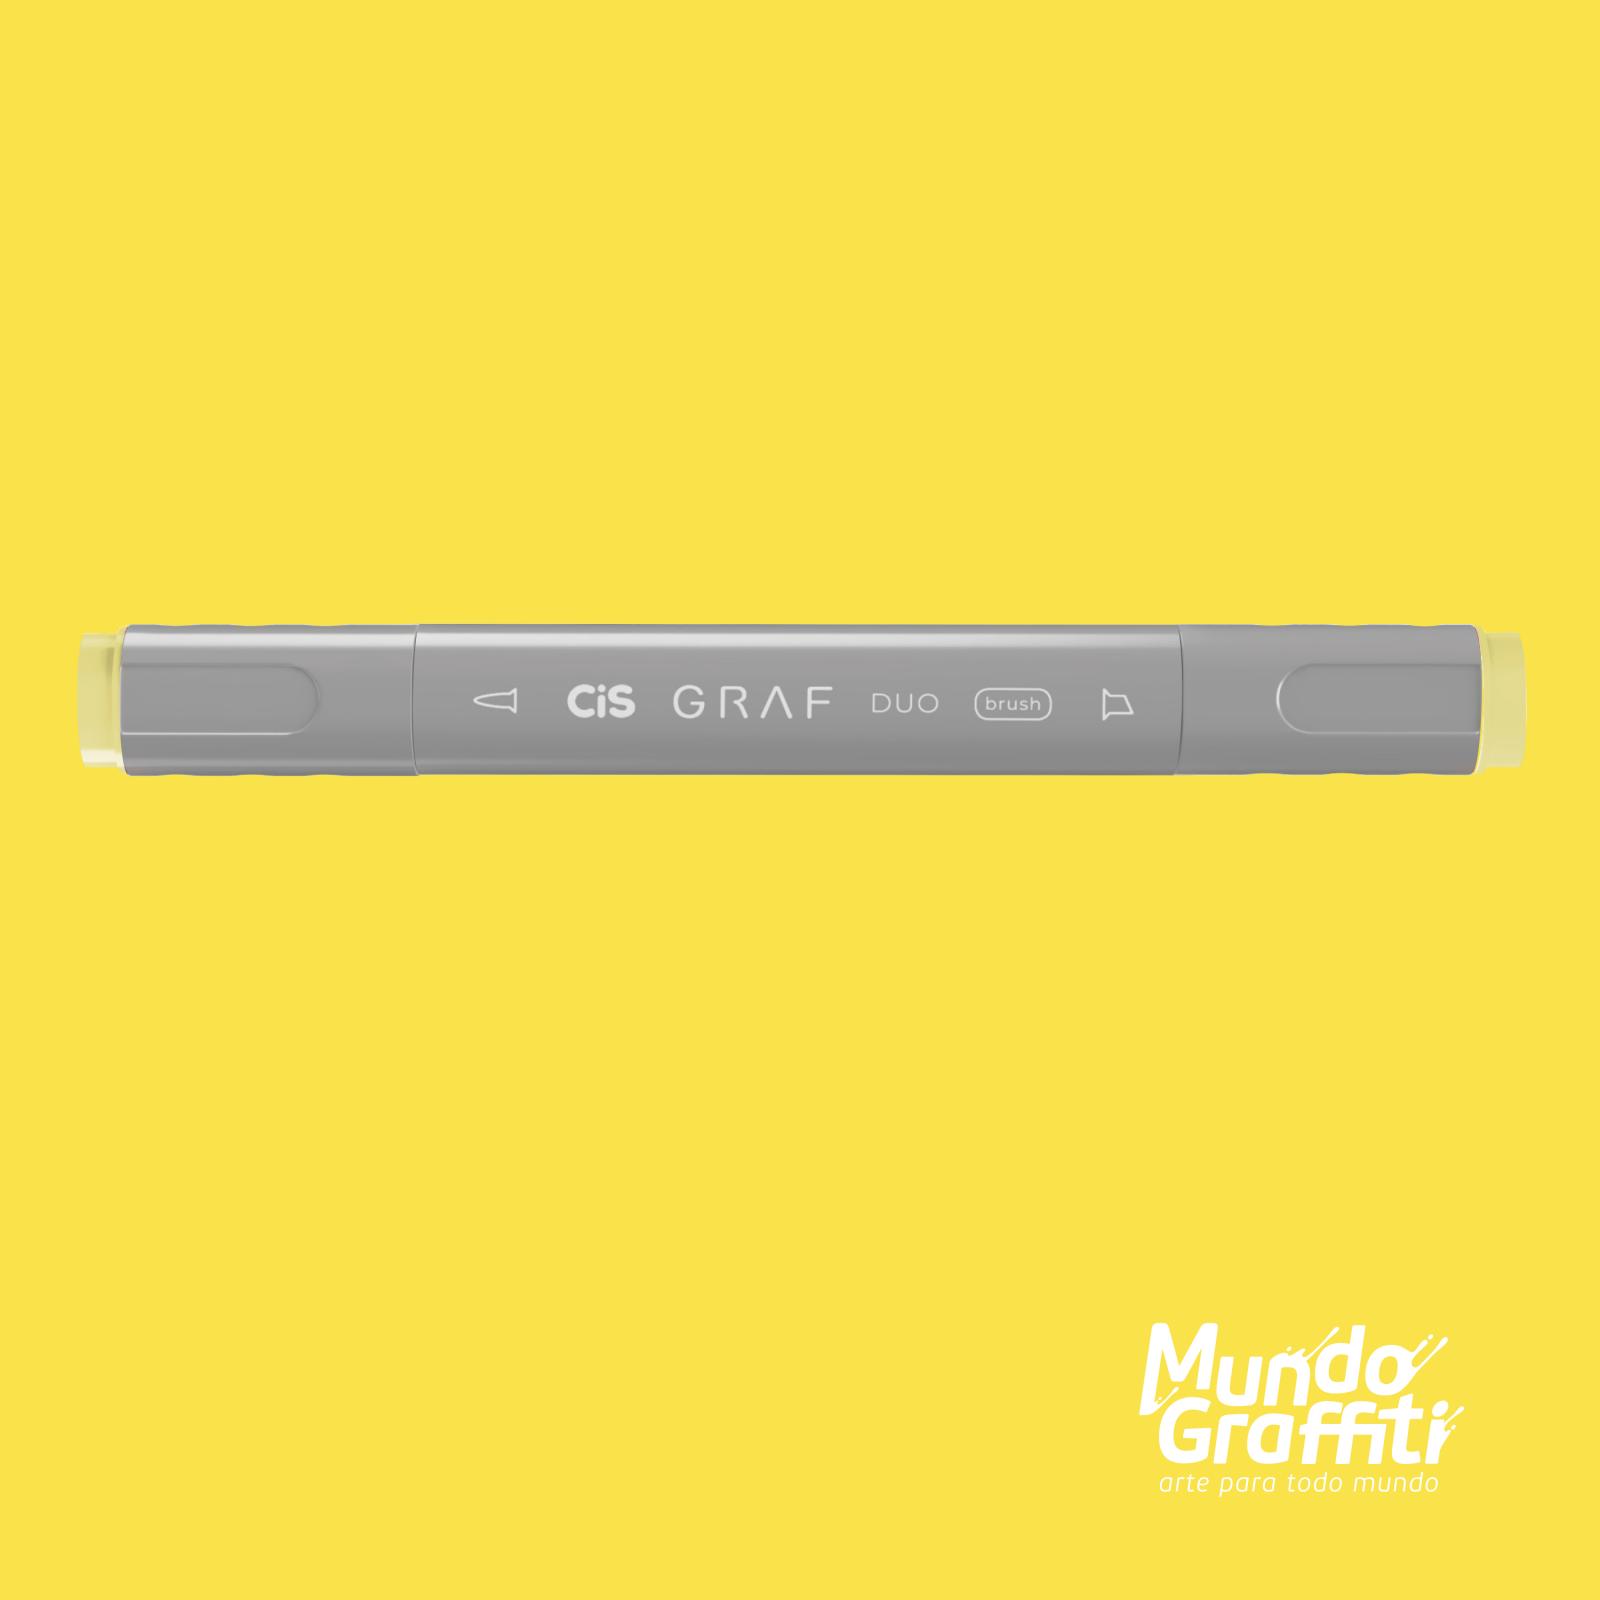 Marcador Cis Graf Duo Brush Pastel Yellow 37 - Mundo Graffiti